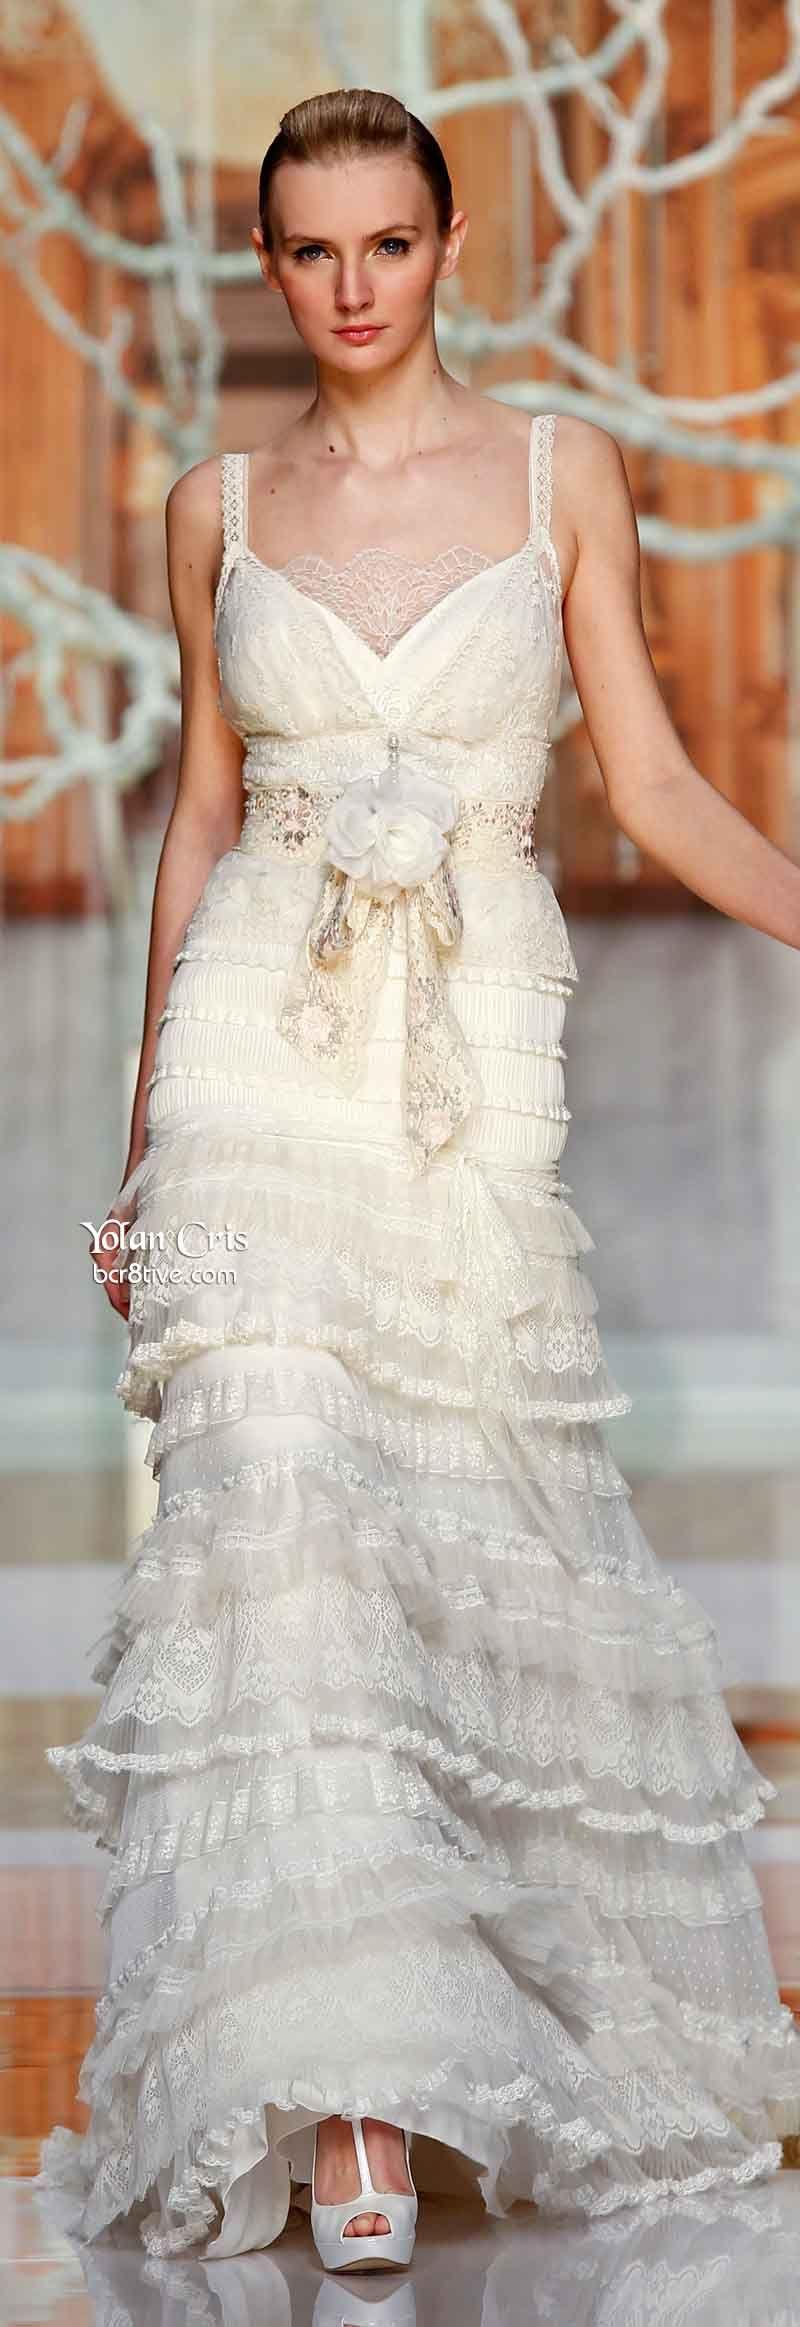 Yolan cris ethereal evanescence spring bridal collection